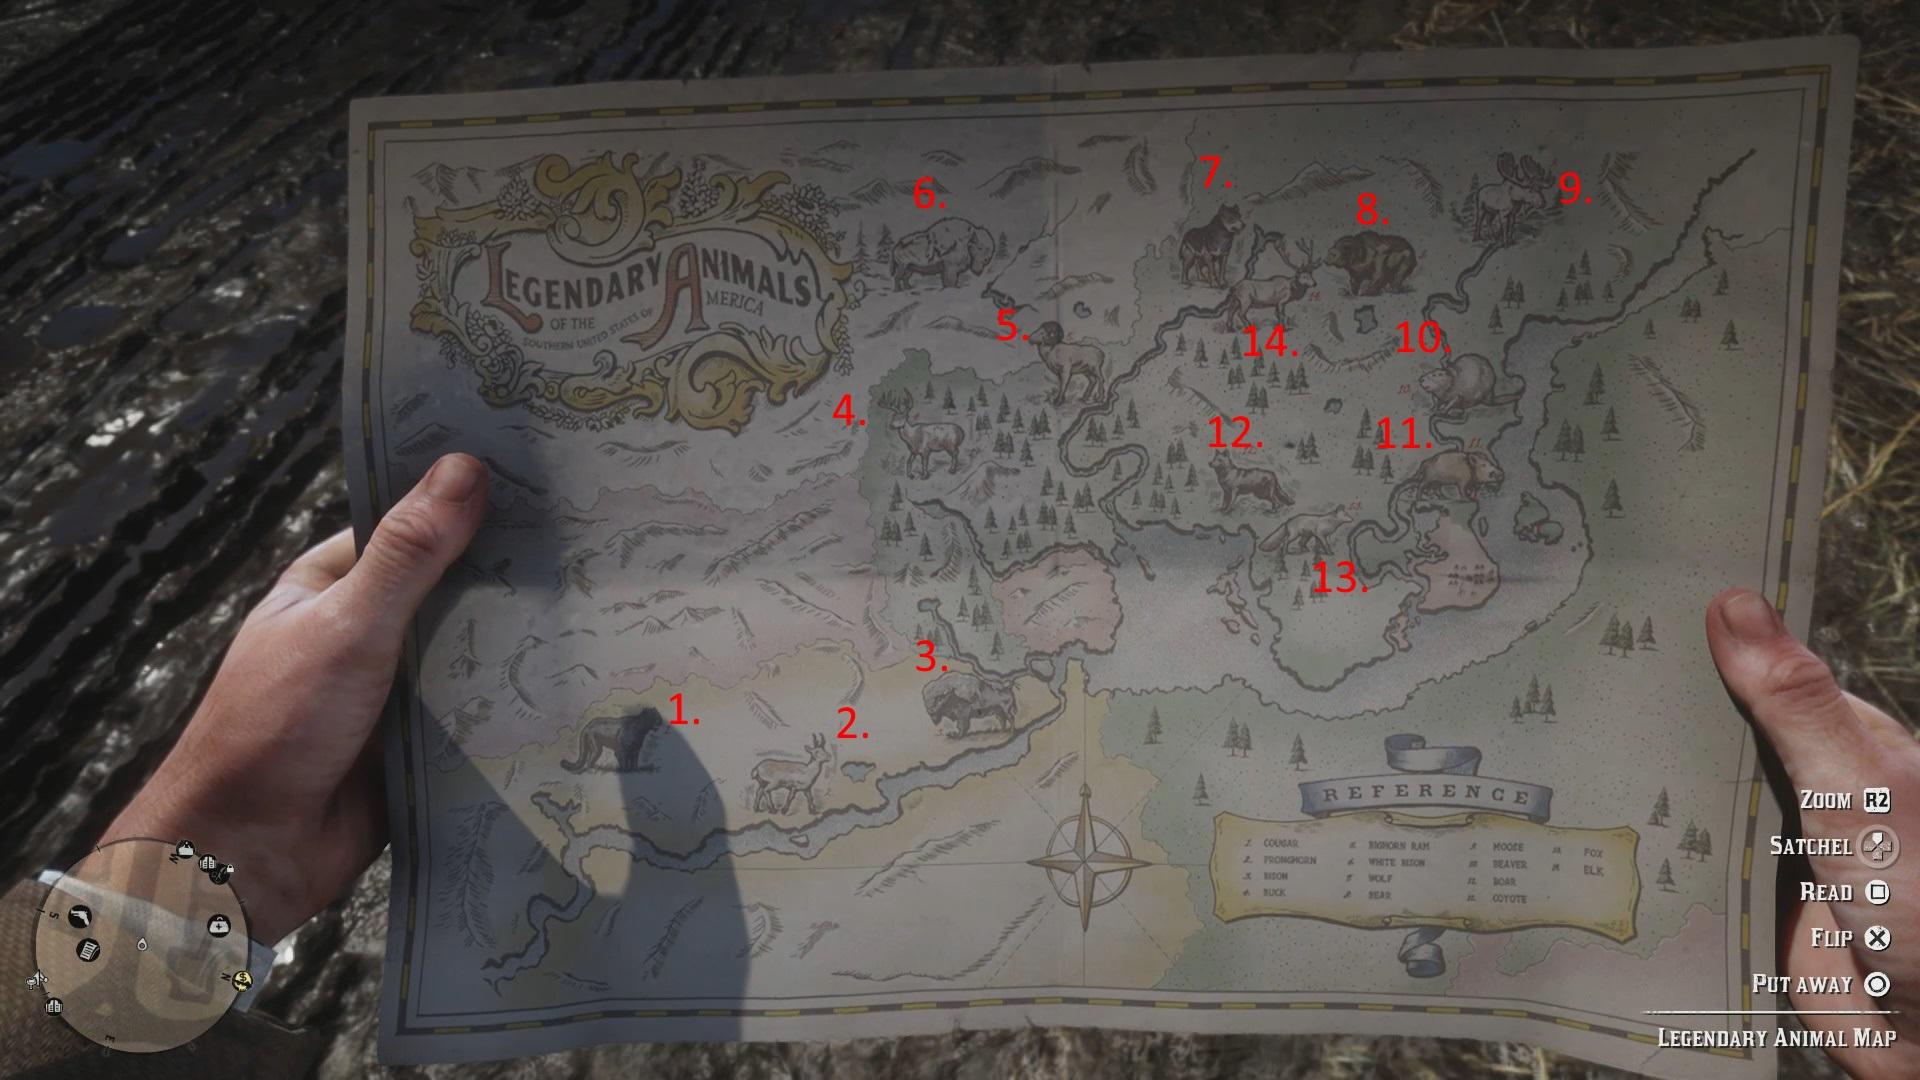 Legendary Animals Map In Red Dead Redemption 2